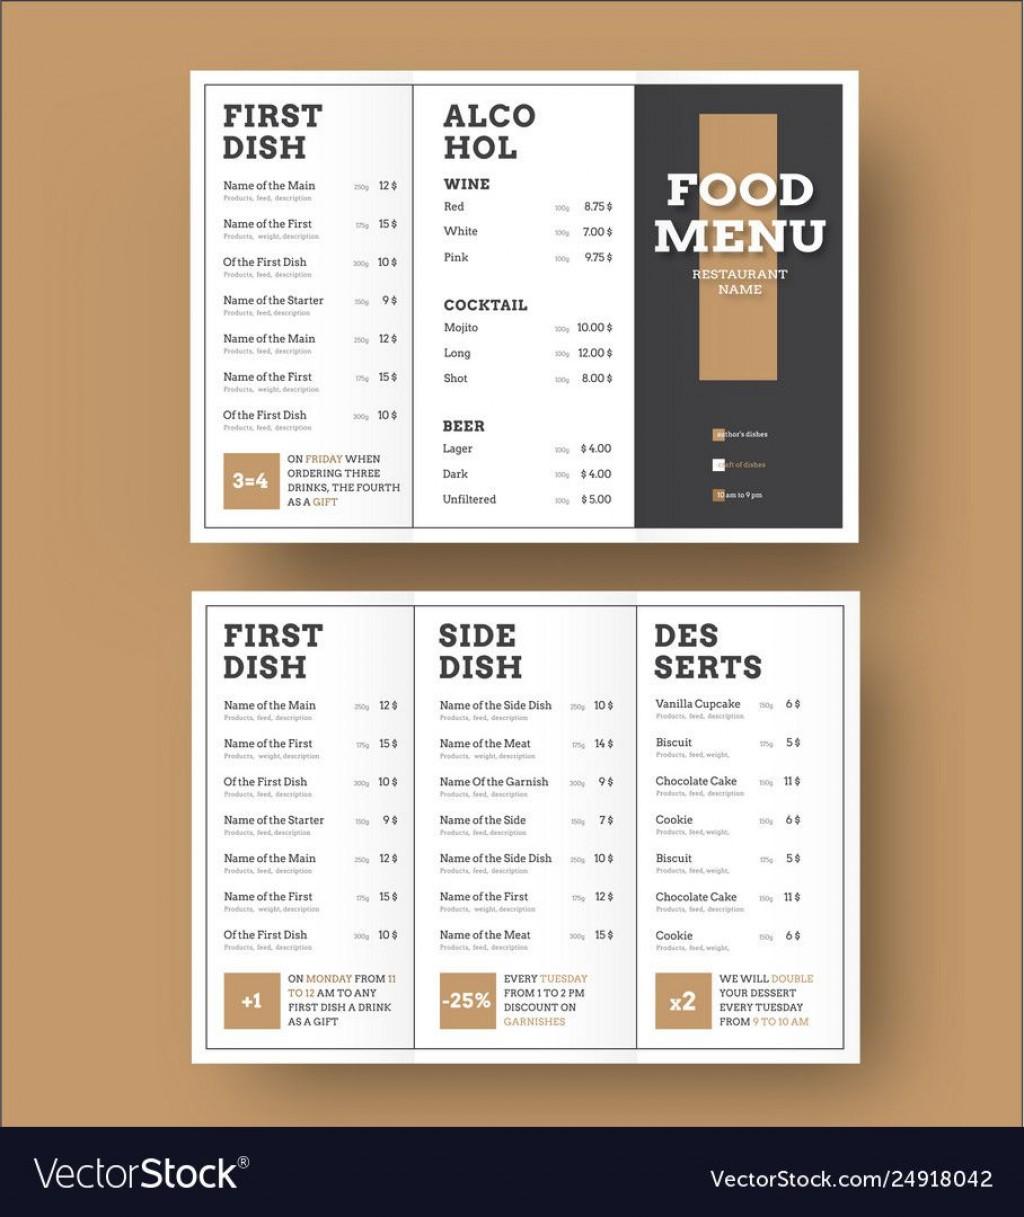 008 Singular Tri Fold Menu Template High Definition  Templates Restaurant Tri-fold Food Free PsdLarge